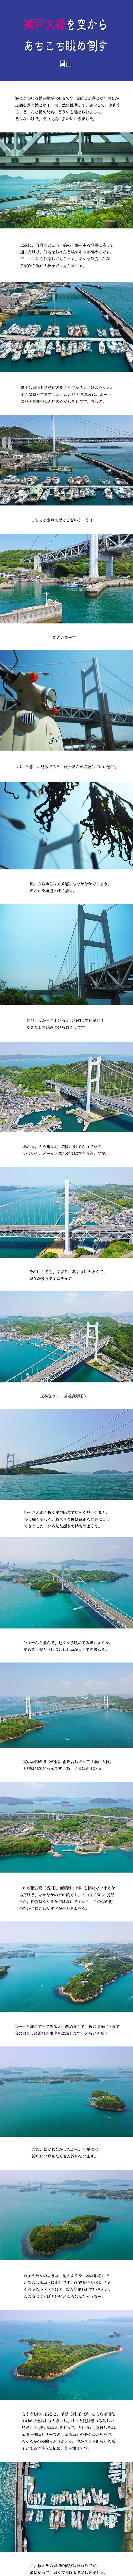 tomako190619.jpg